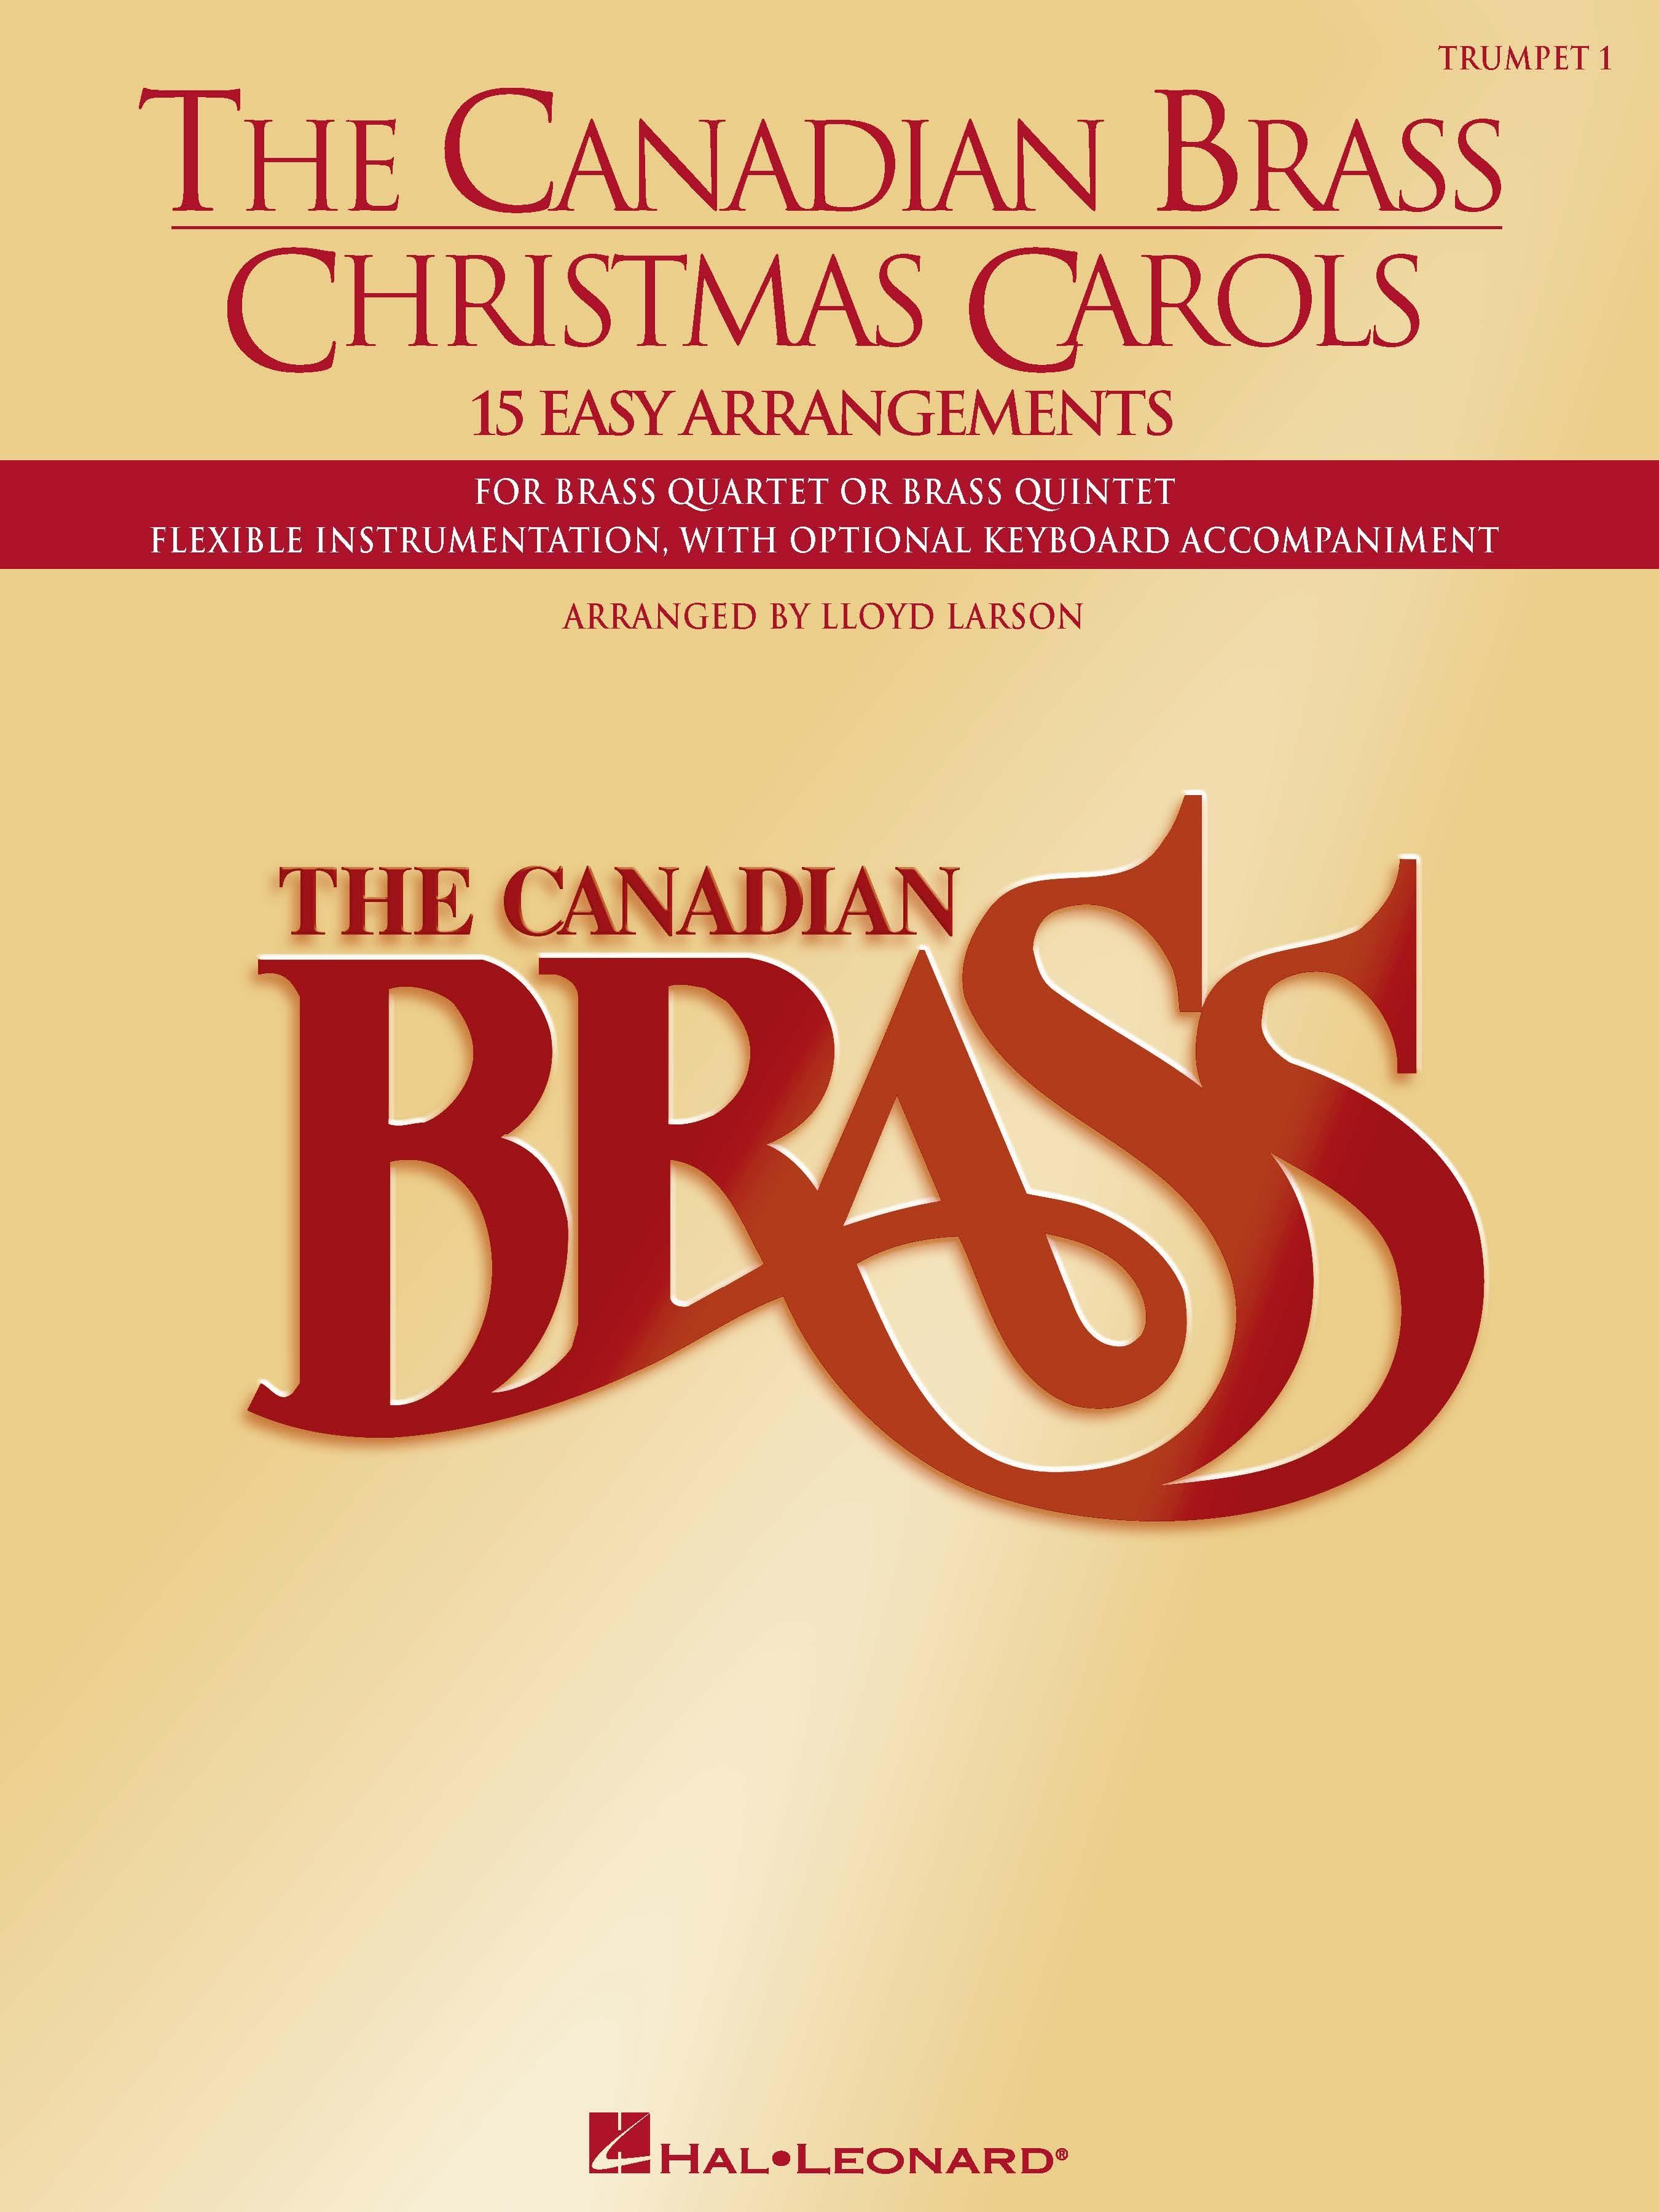 The Canadian Brass: Christmas Carols